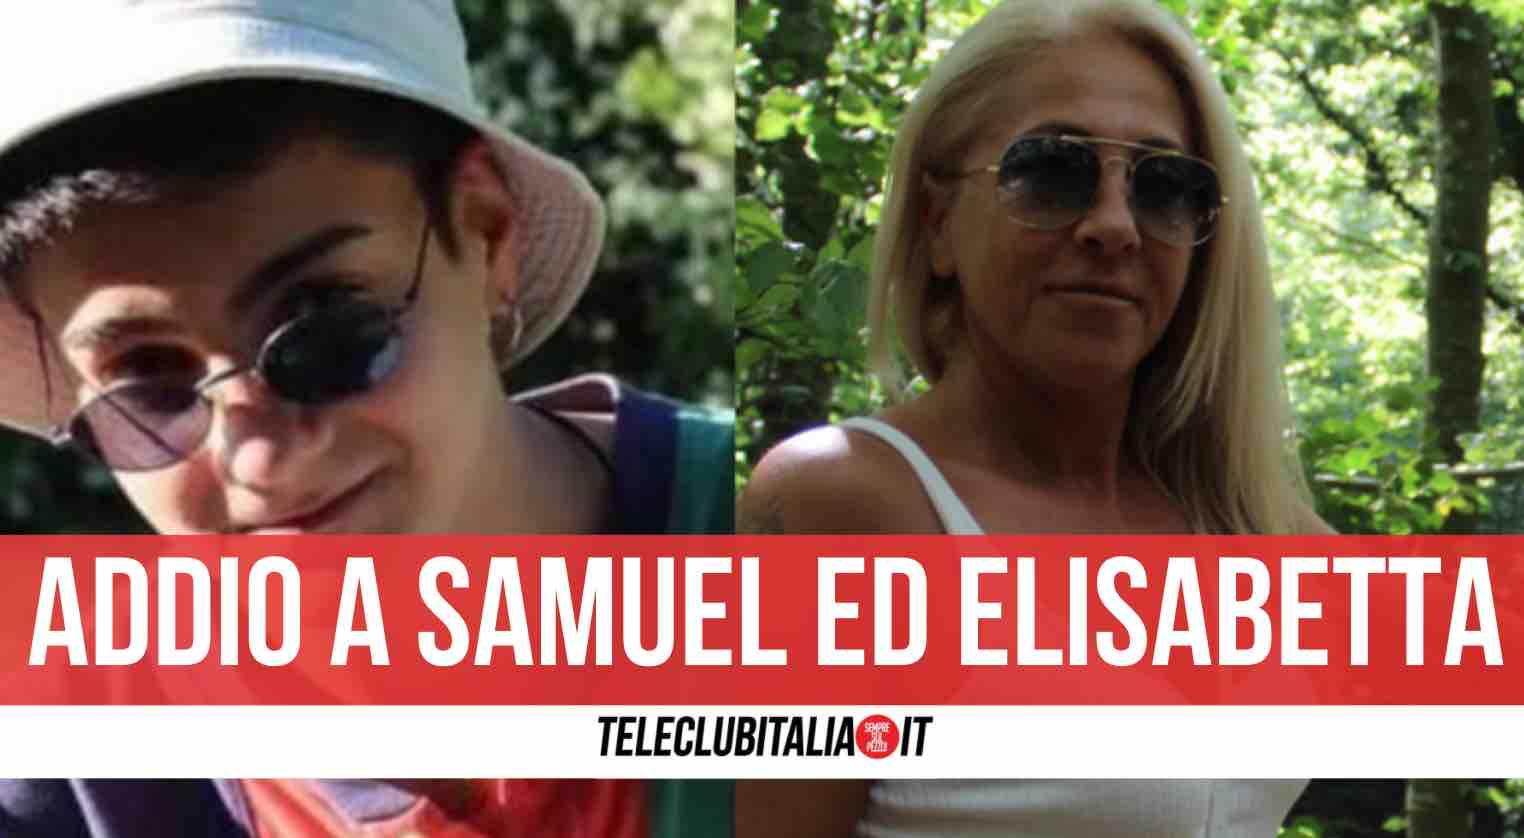 esplosione gubbio morti Samuel Cuffaro Elisabetta D'Innocenzo